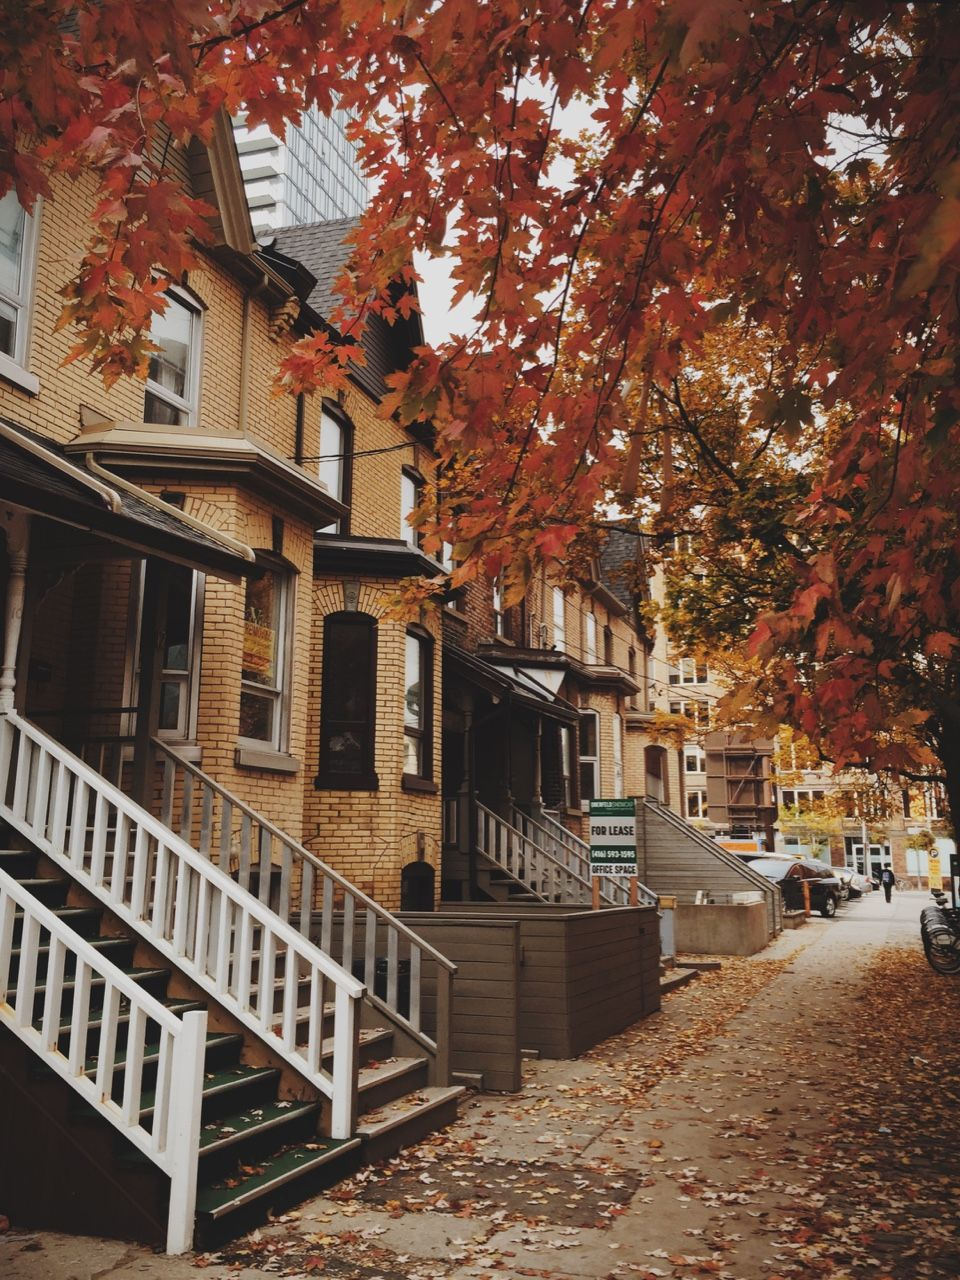 Colorado Fall Wallpaper Autumn Cozy Photo Autumn Pinterest Autumn Cozy